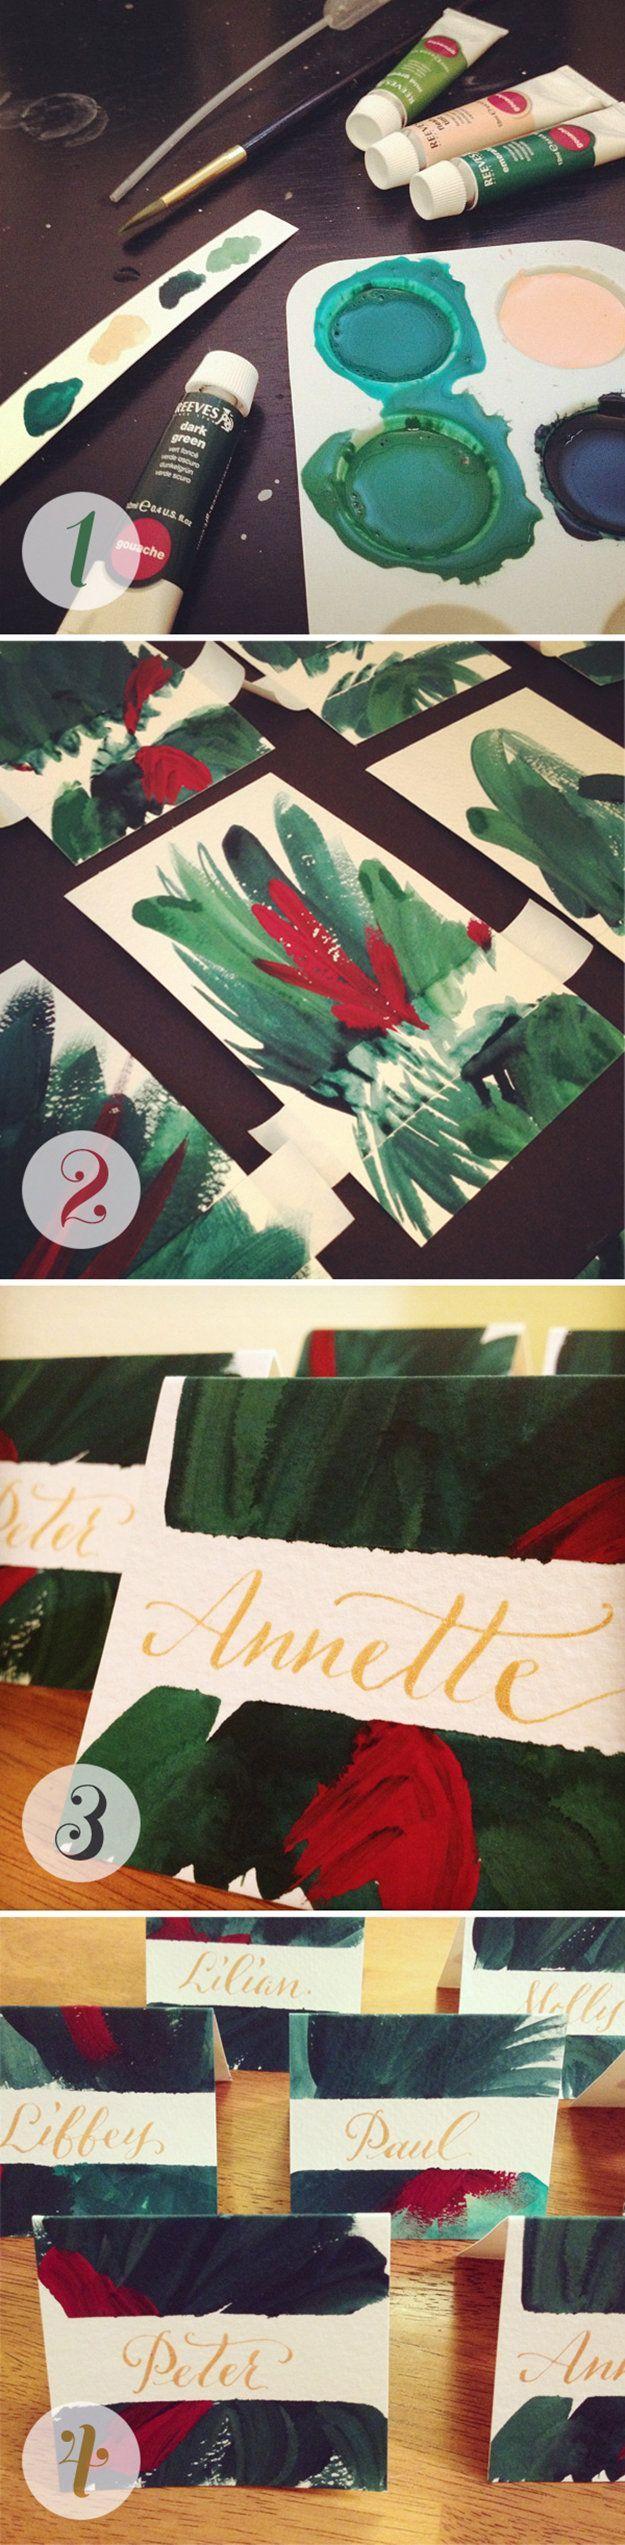 Christmas Cards! Hand-painted Christmas Card Inspiration | http://diyready.com/22-handmade-calligraphy-christmas-cards-diy-christmas-cards/